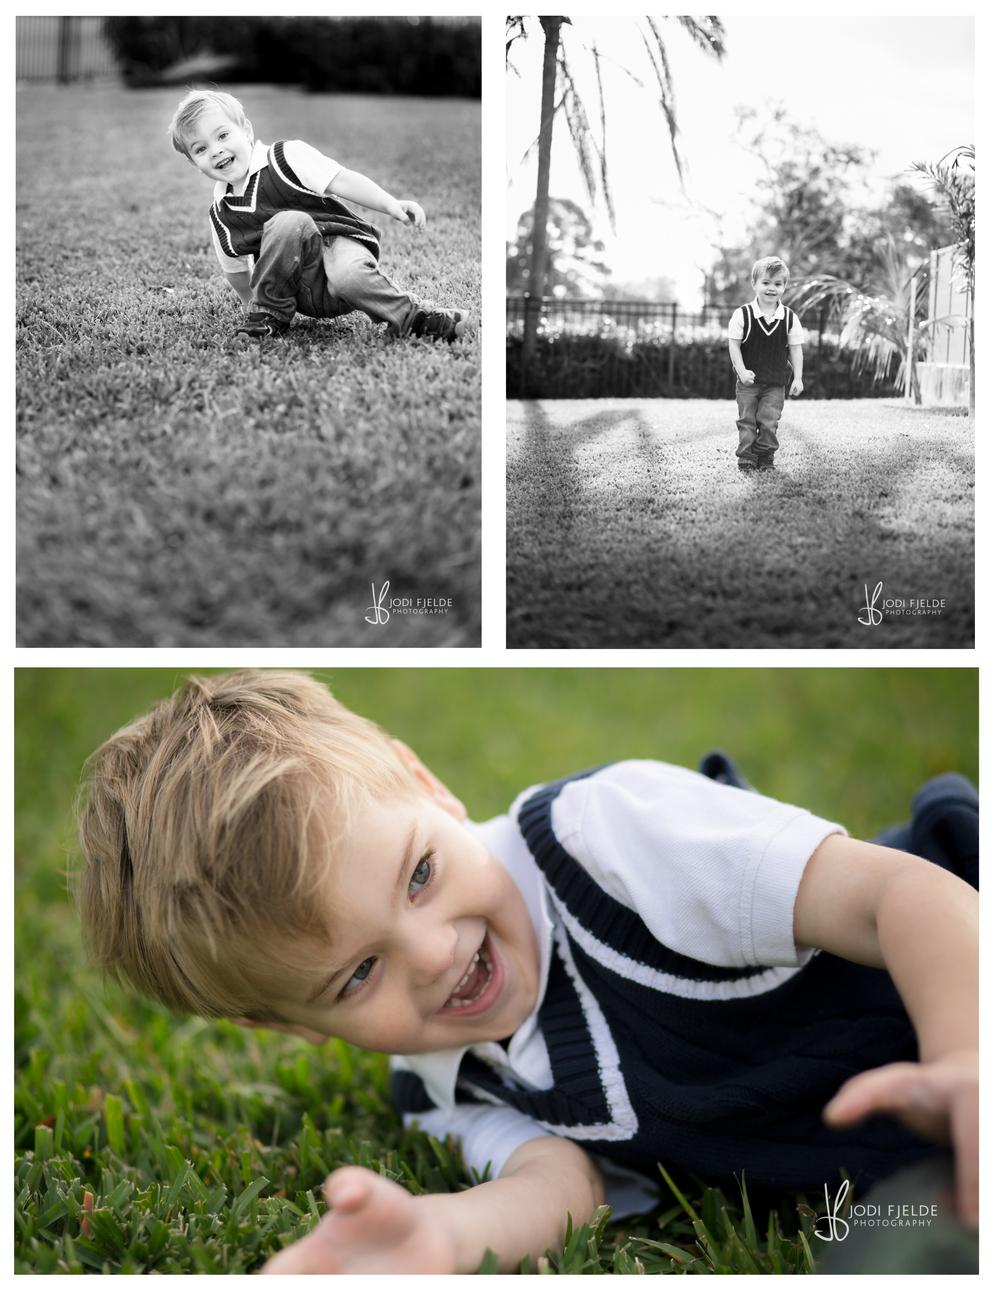 Boynton_Beach_Child_Photographer_Brady_Jodi_Fjelde_Photography 12.jpg